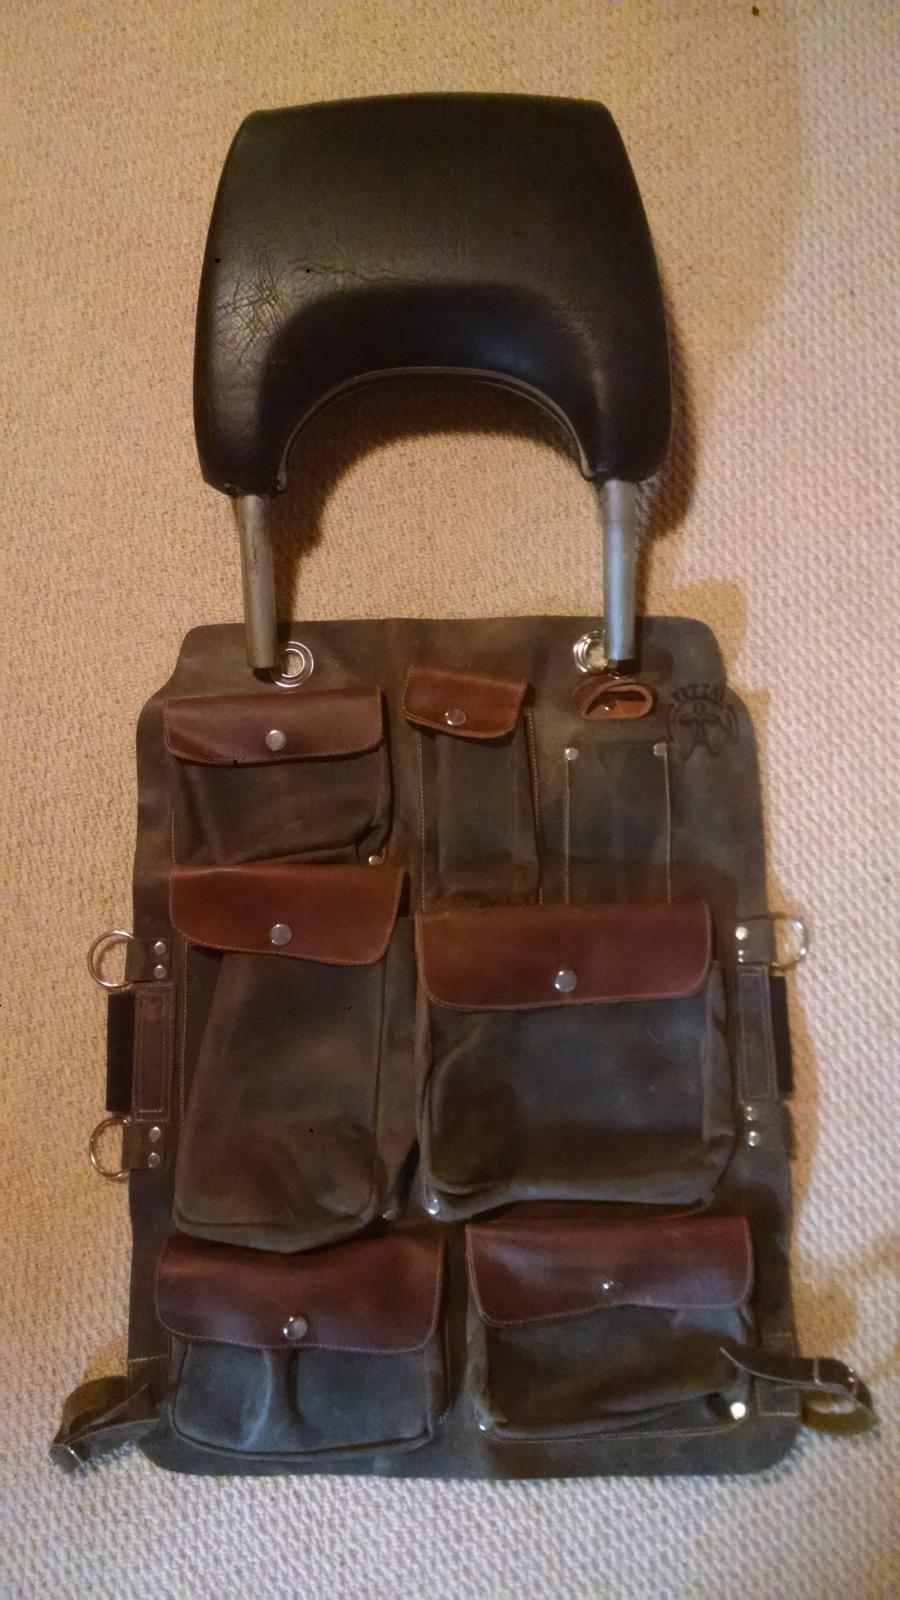 Ketzal seat pockets for a Baywindow?